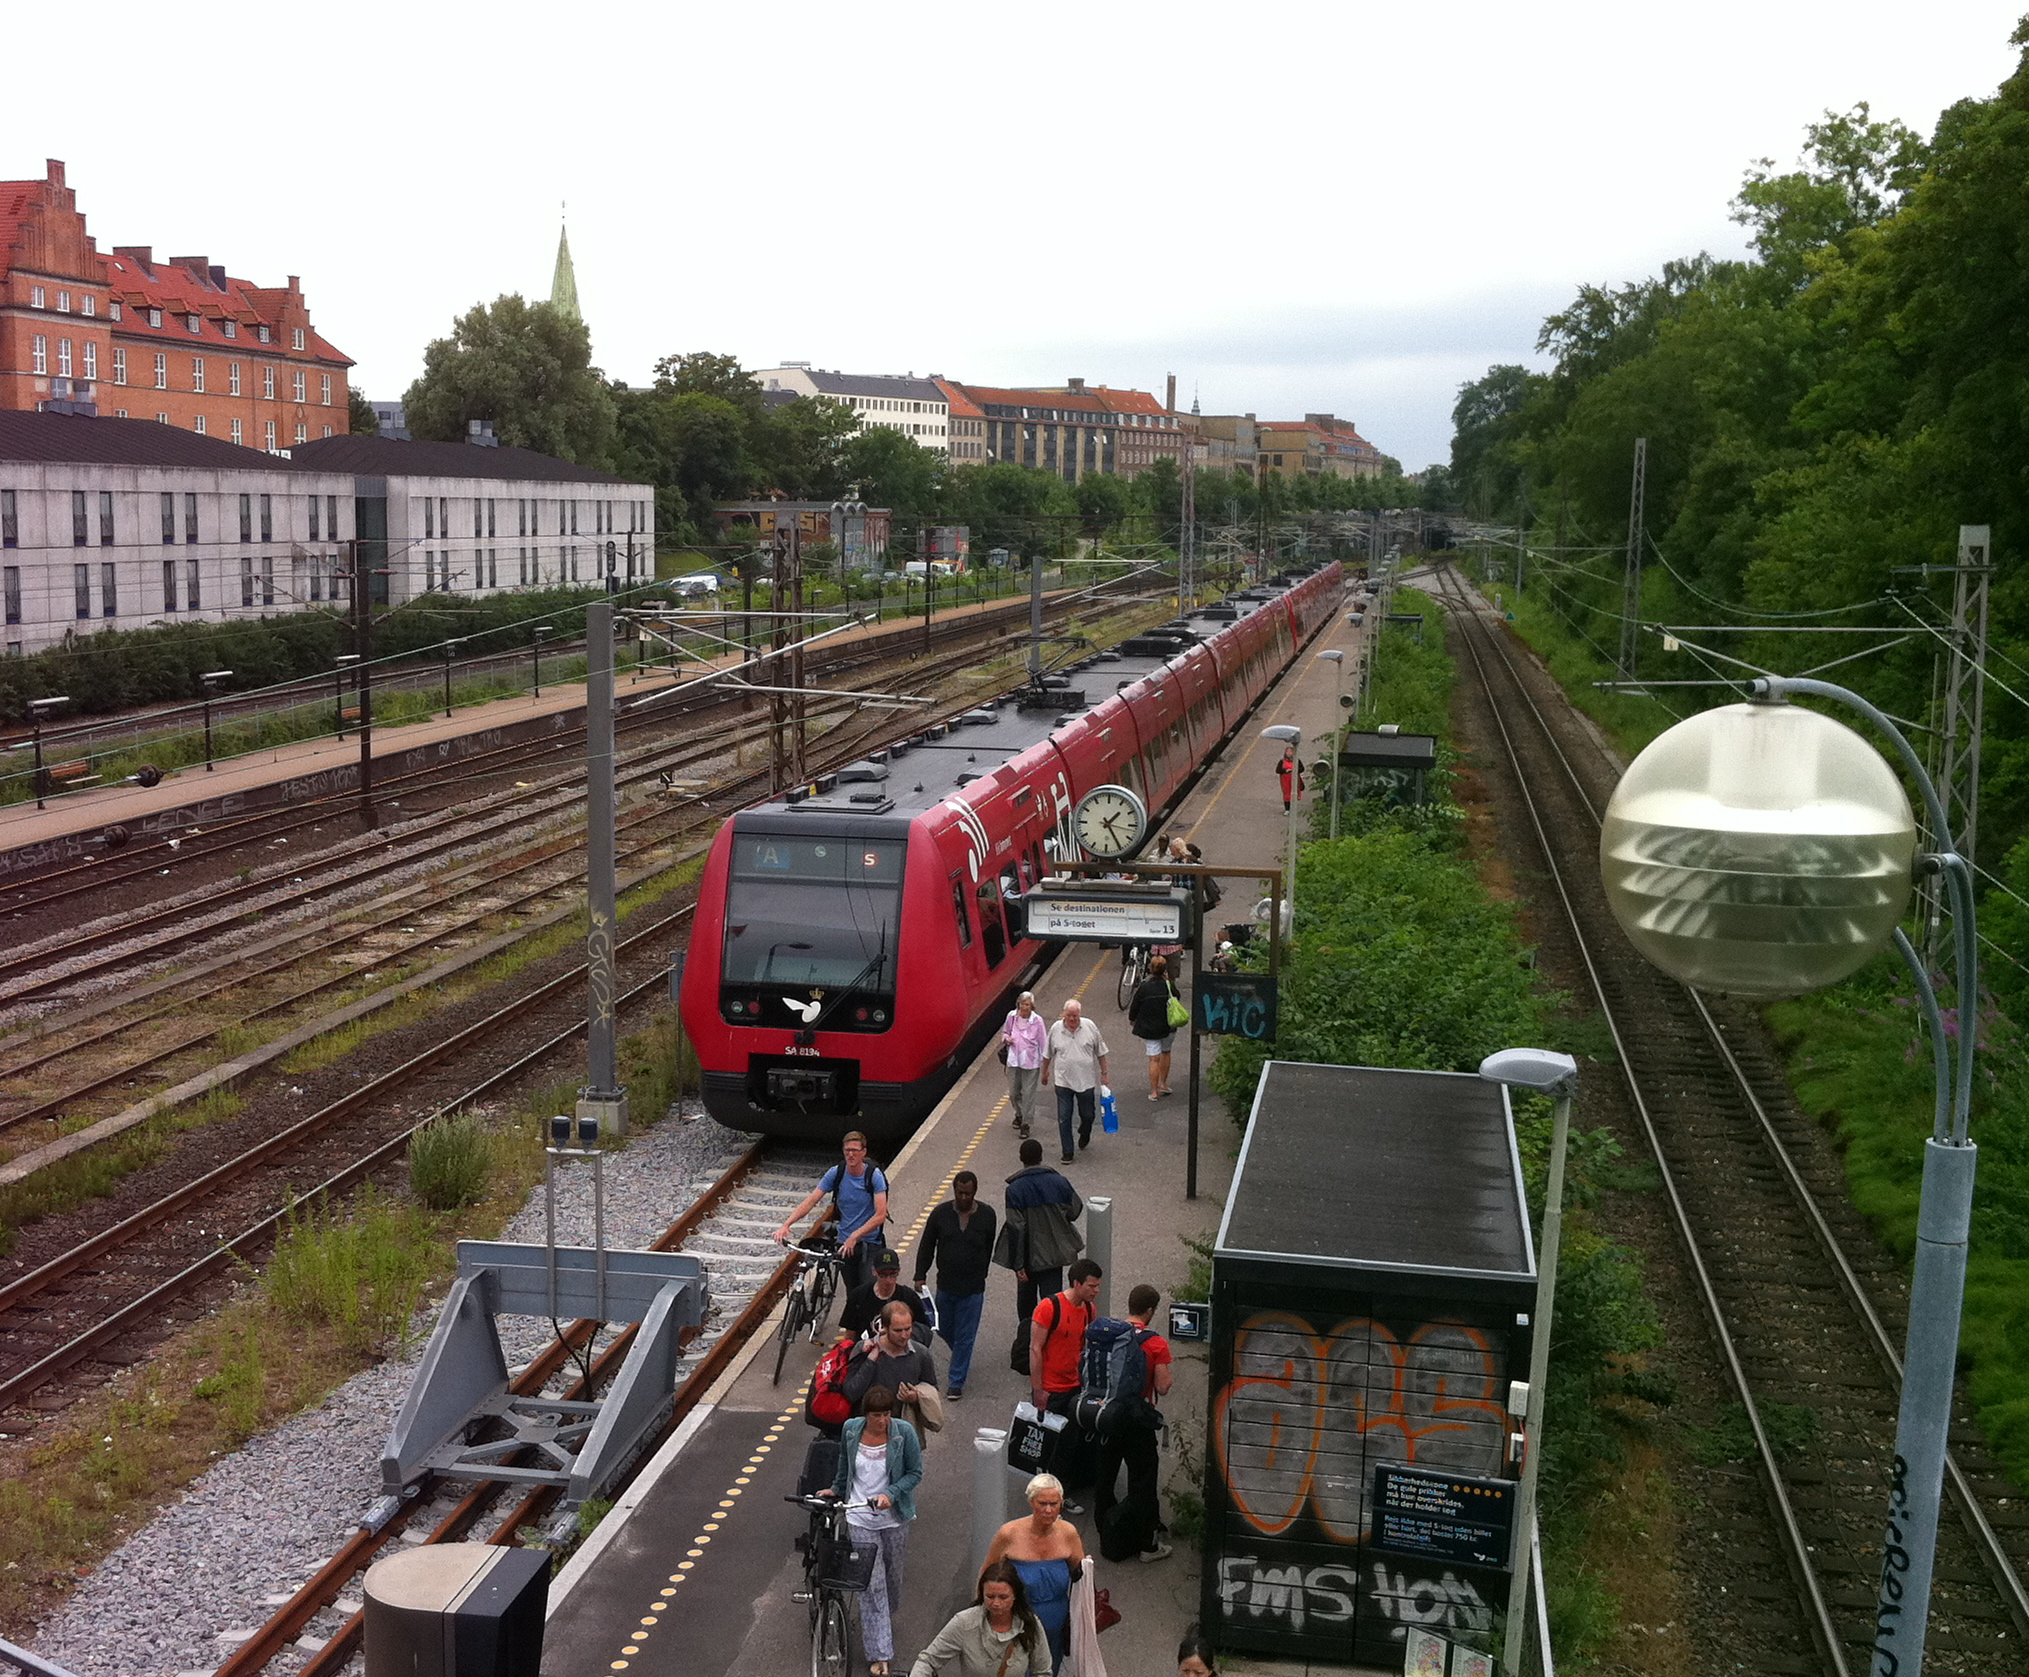 File:Østerport S-tog.JPG - Wikimedia Commons